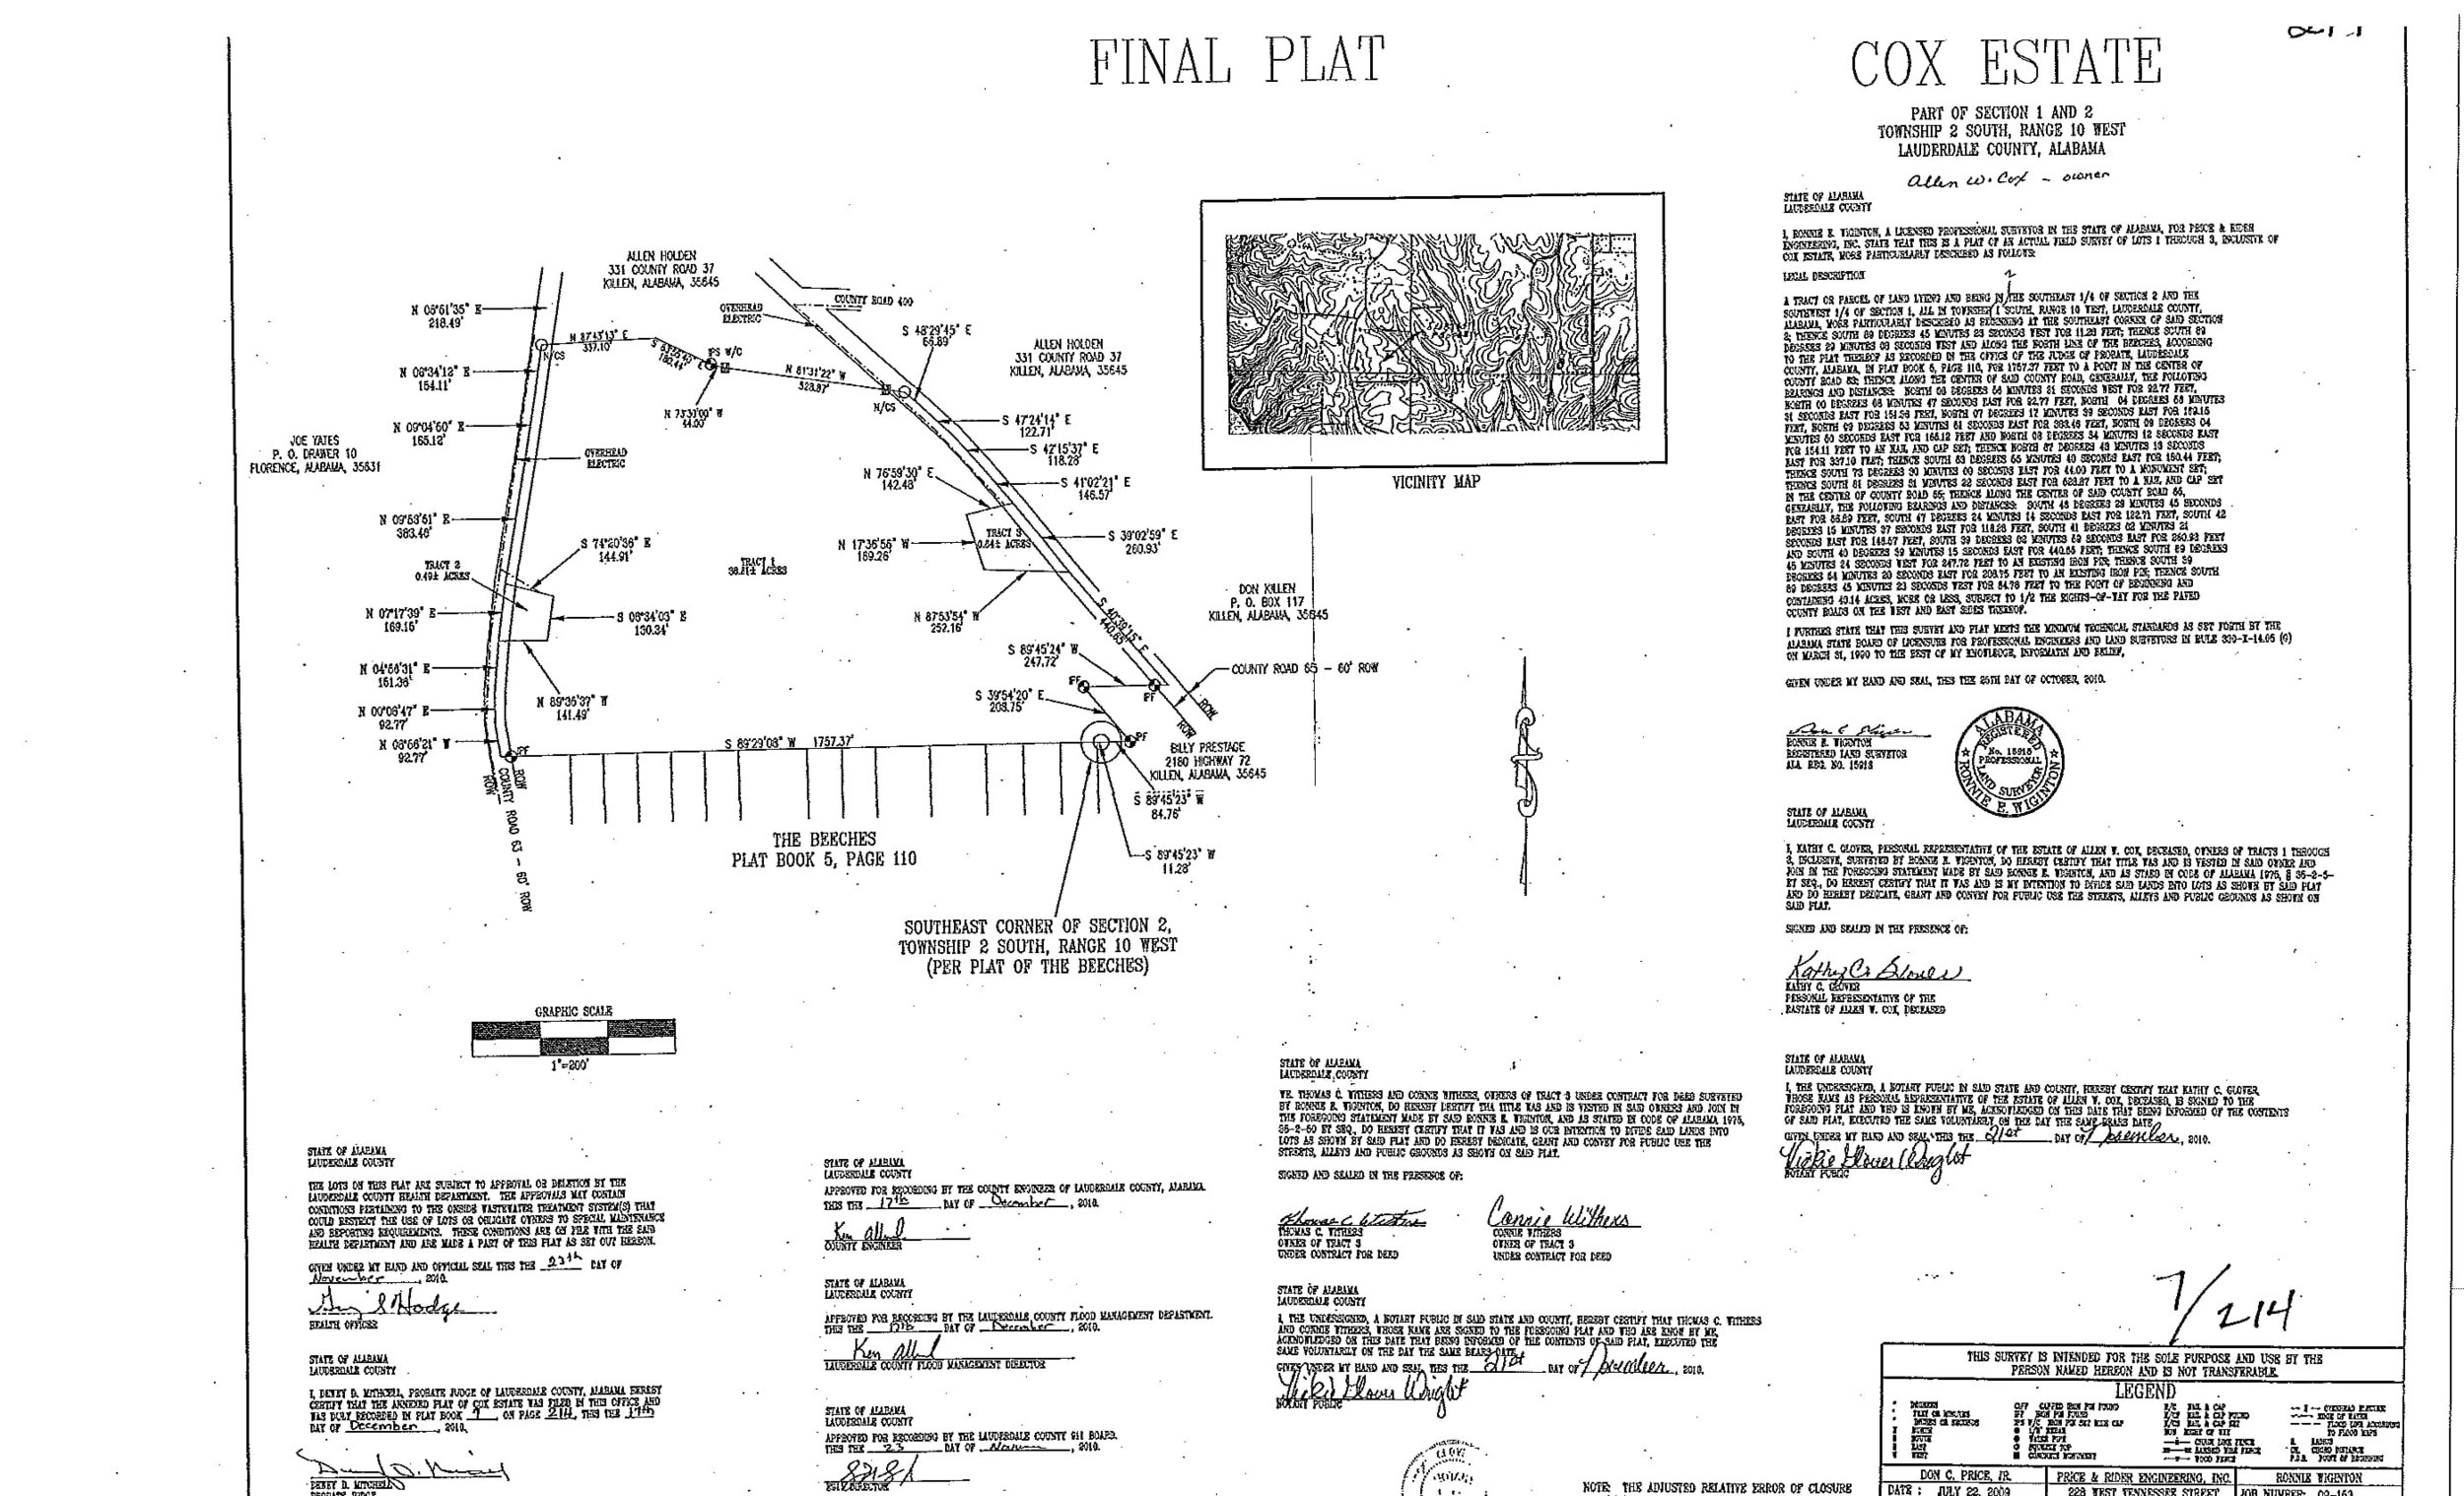 cox estate-1.jpg